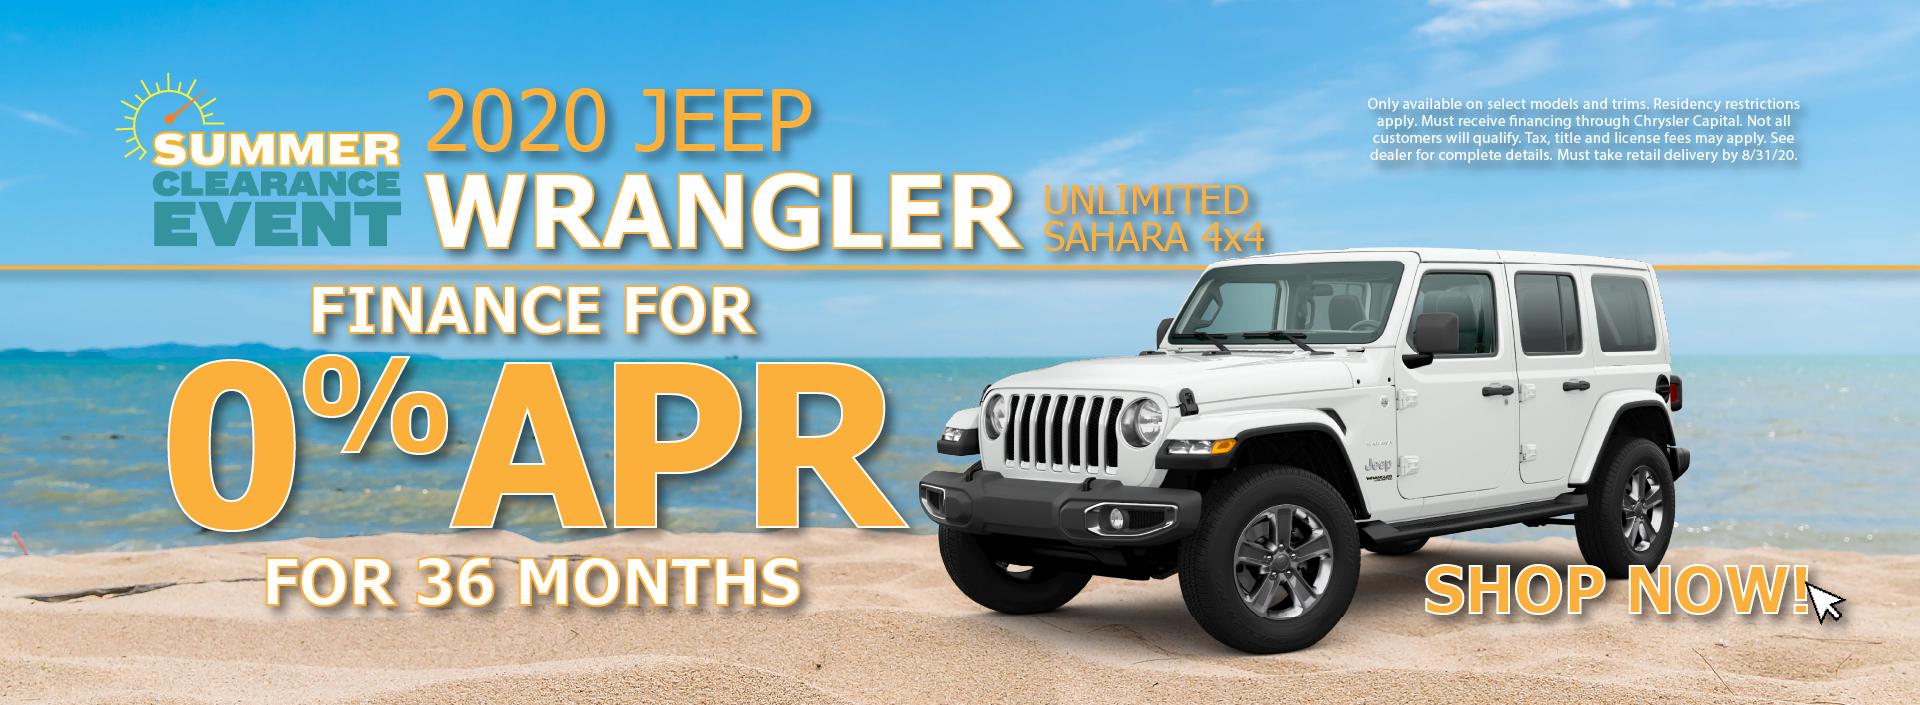 2020 Jeep Wrangler Unlimited 0% APR